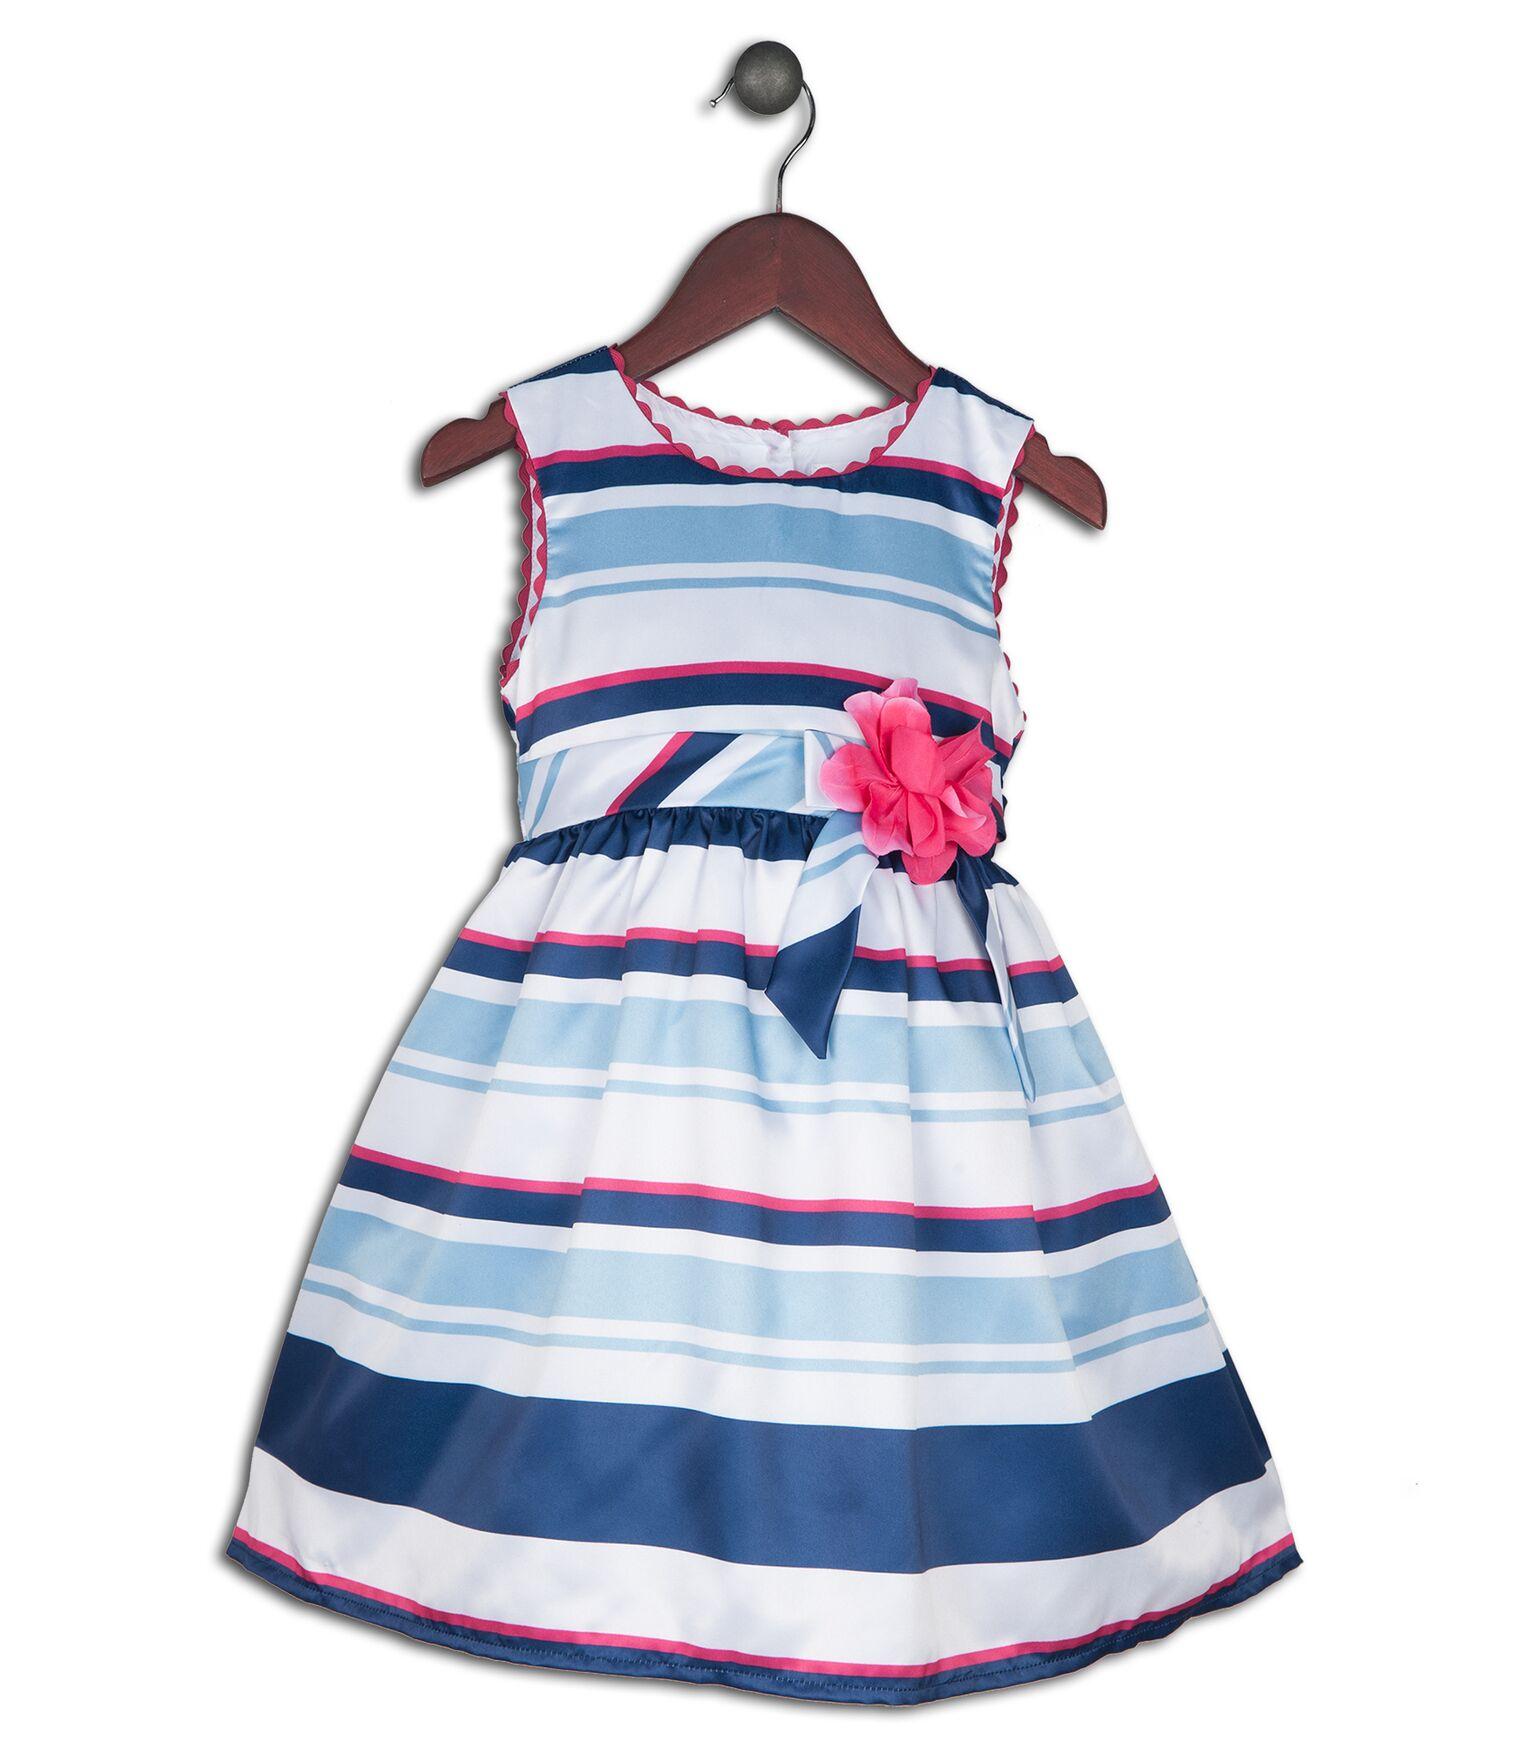 Joe and Ella Fashion Dievčenské šaty Alyson pruhované - modro-biele ... 05566a28811